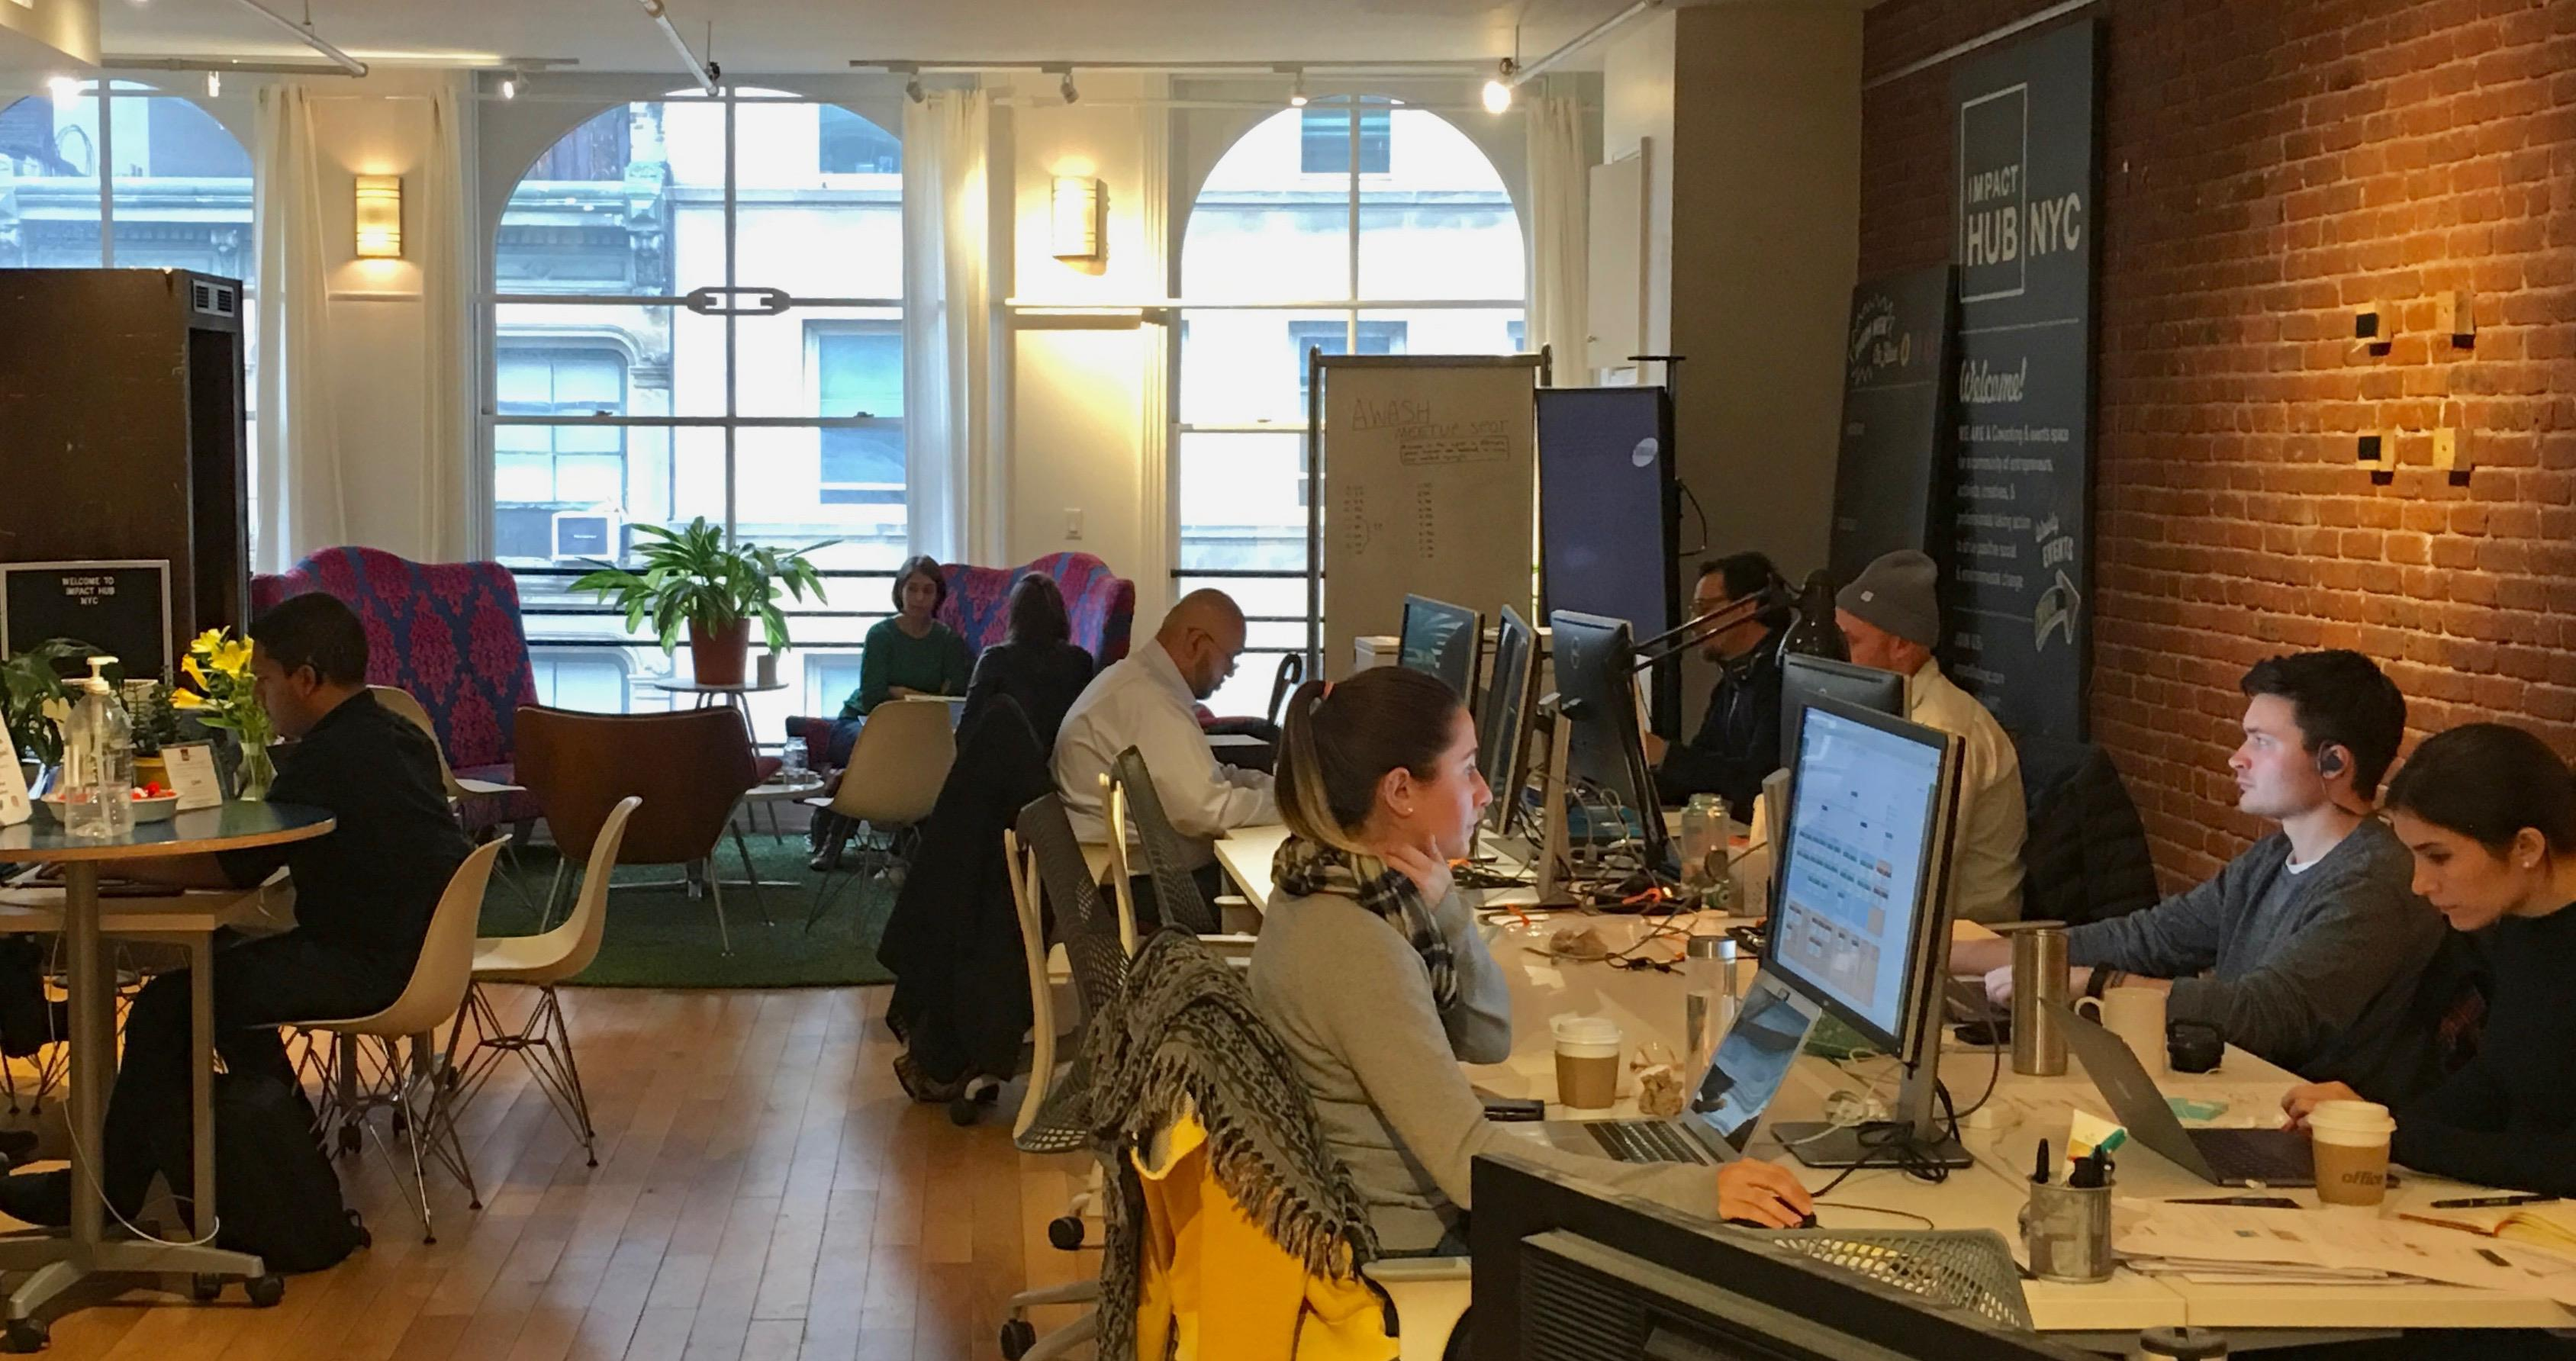 Impact Hub NYC - CommunityPlus Co-working